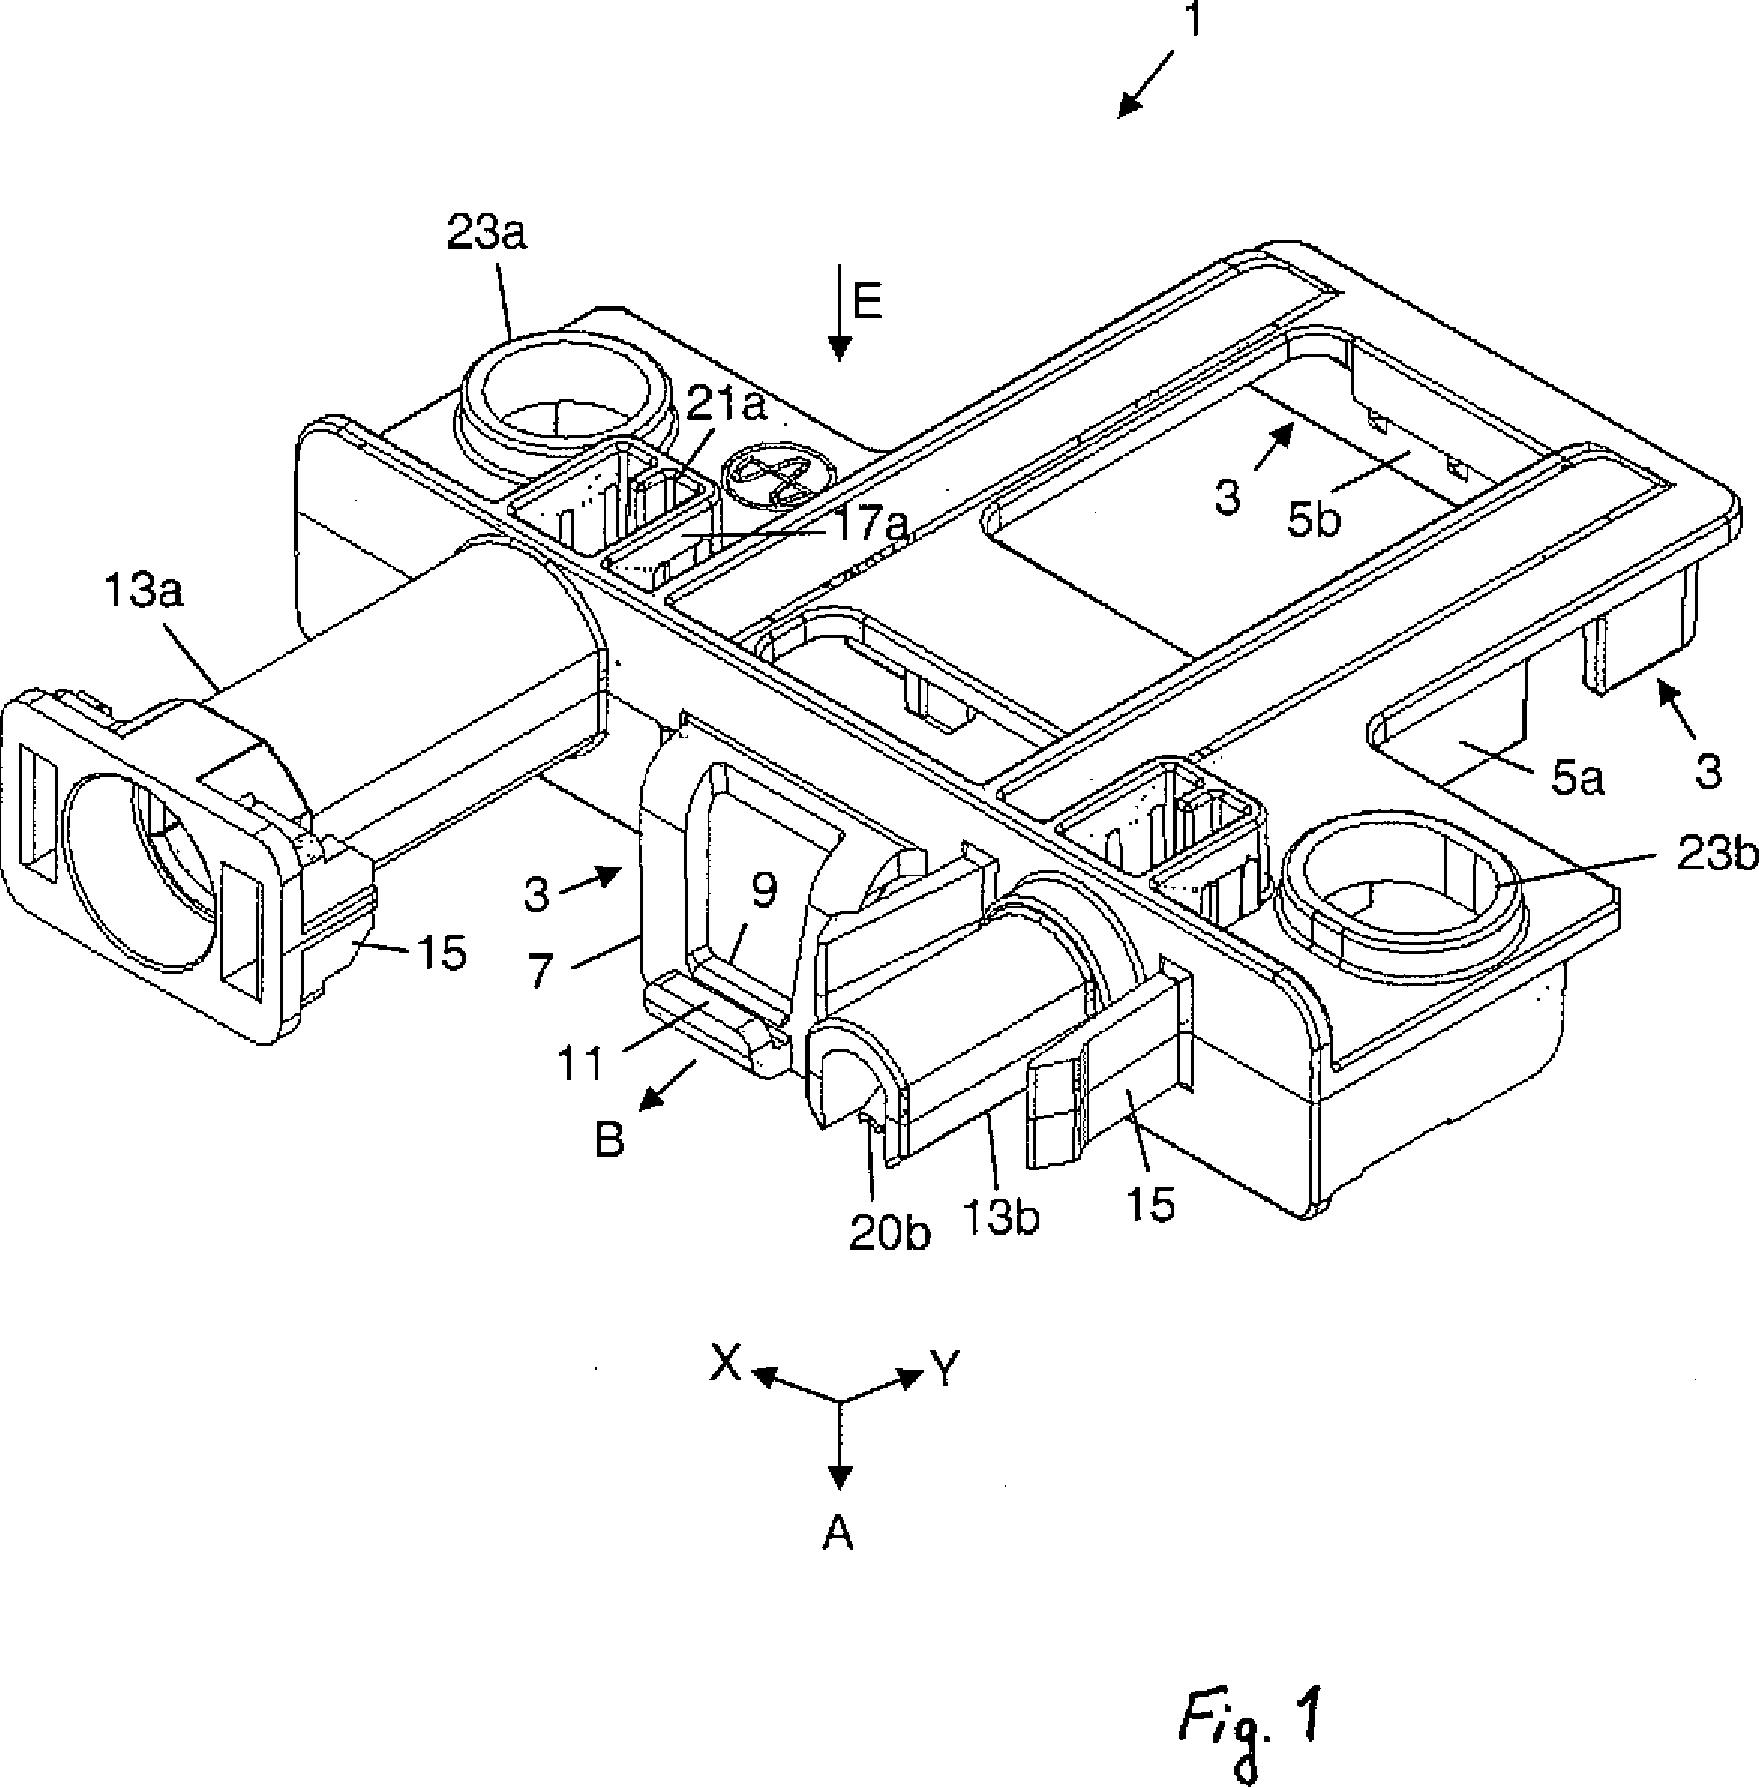 patente de102011016564a1